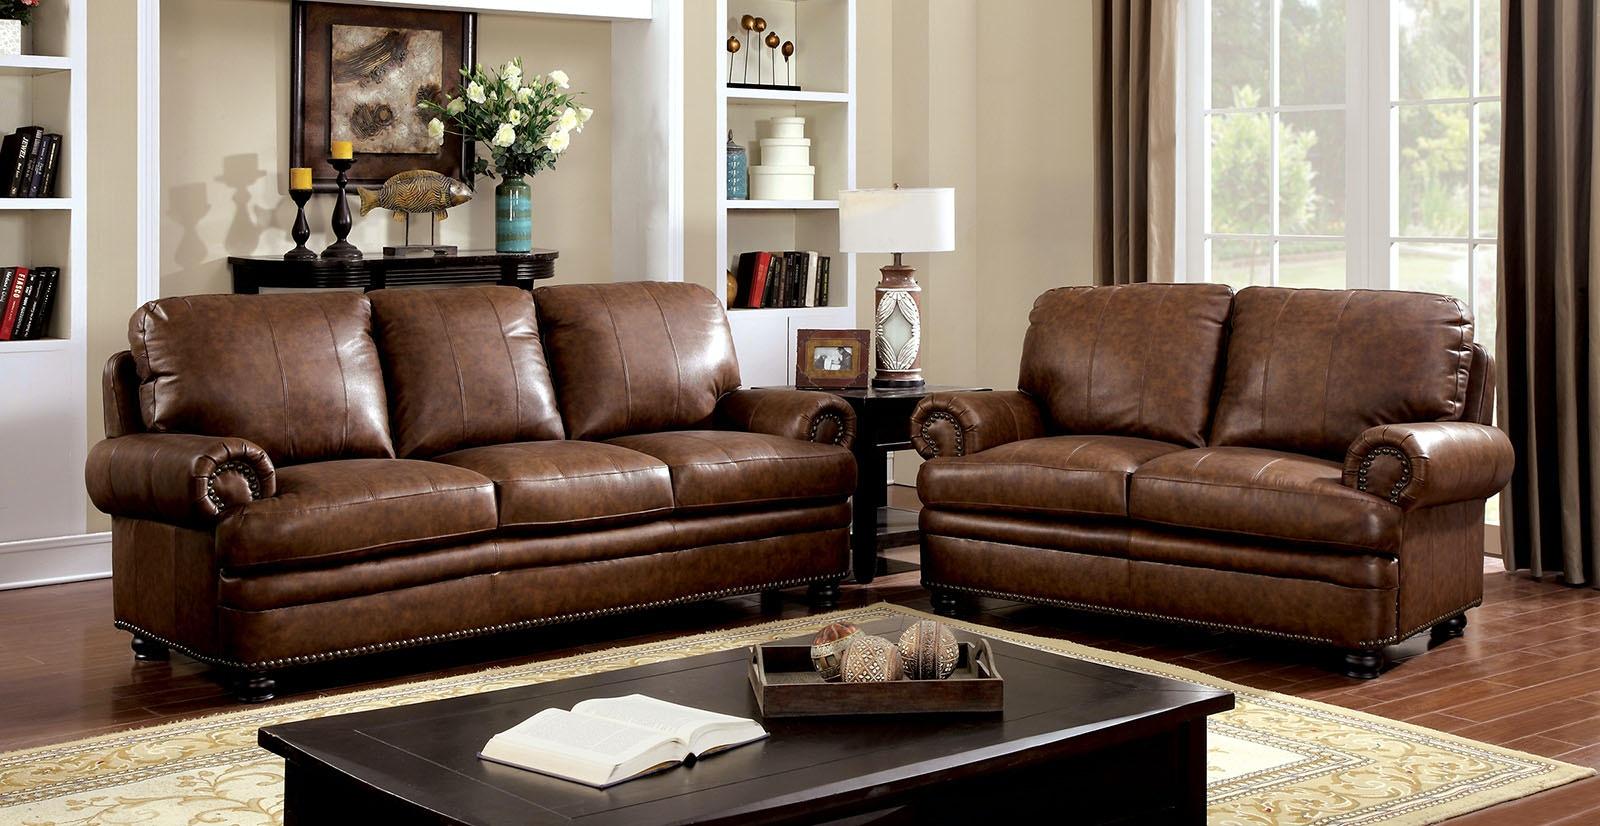 Gentil Furniture Of America Love Seat, Brown CM6318 LV